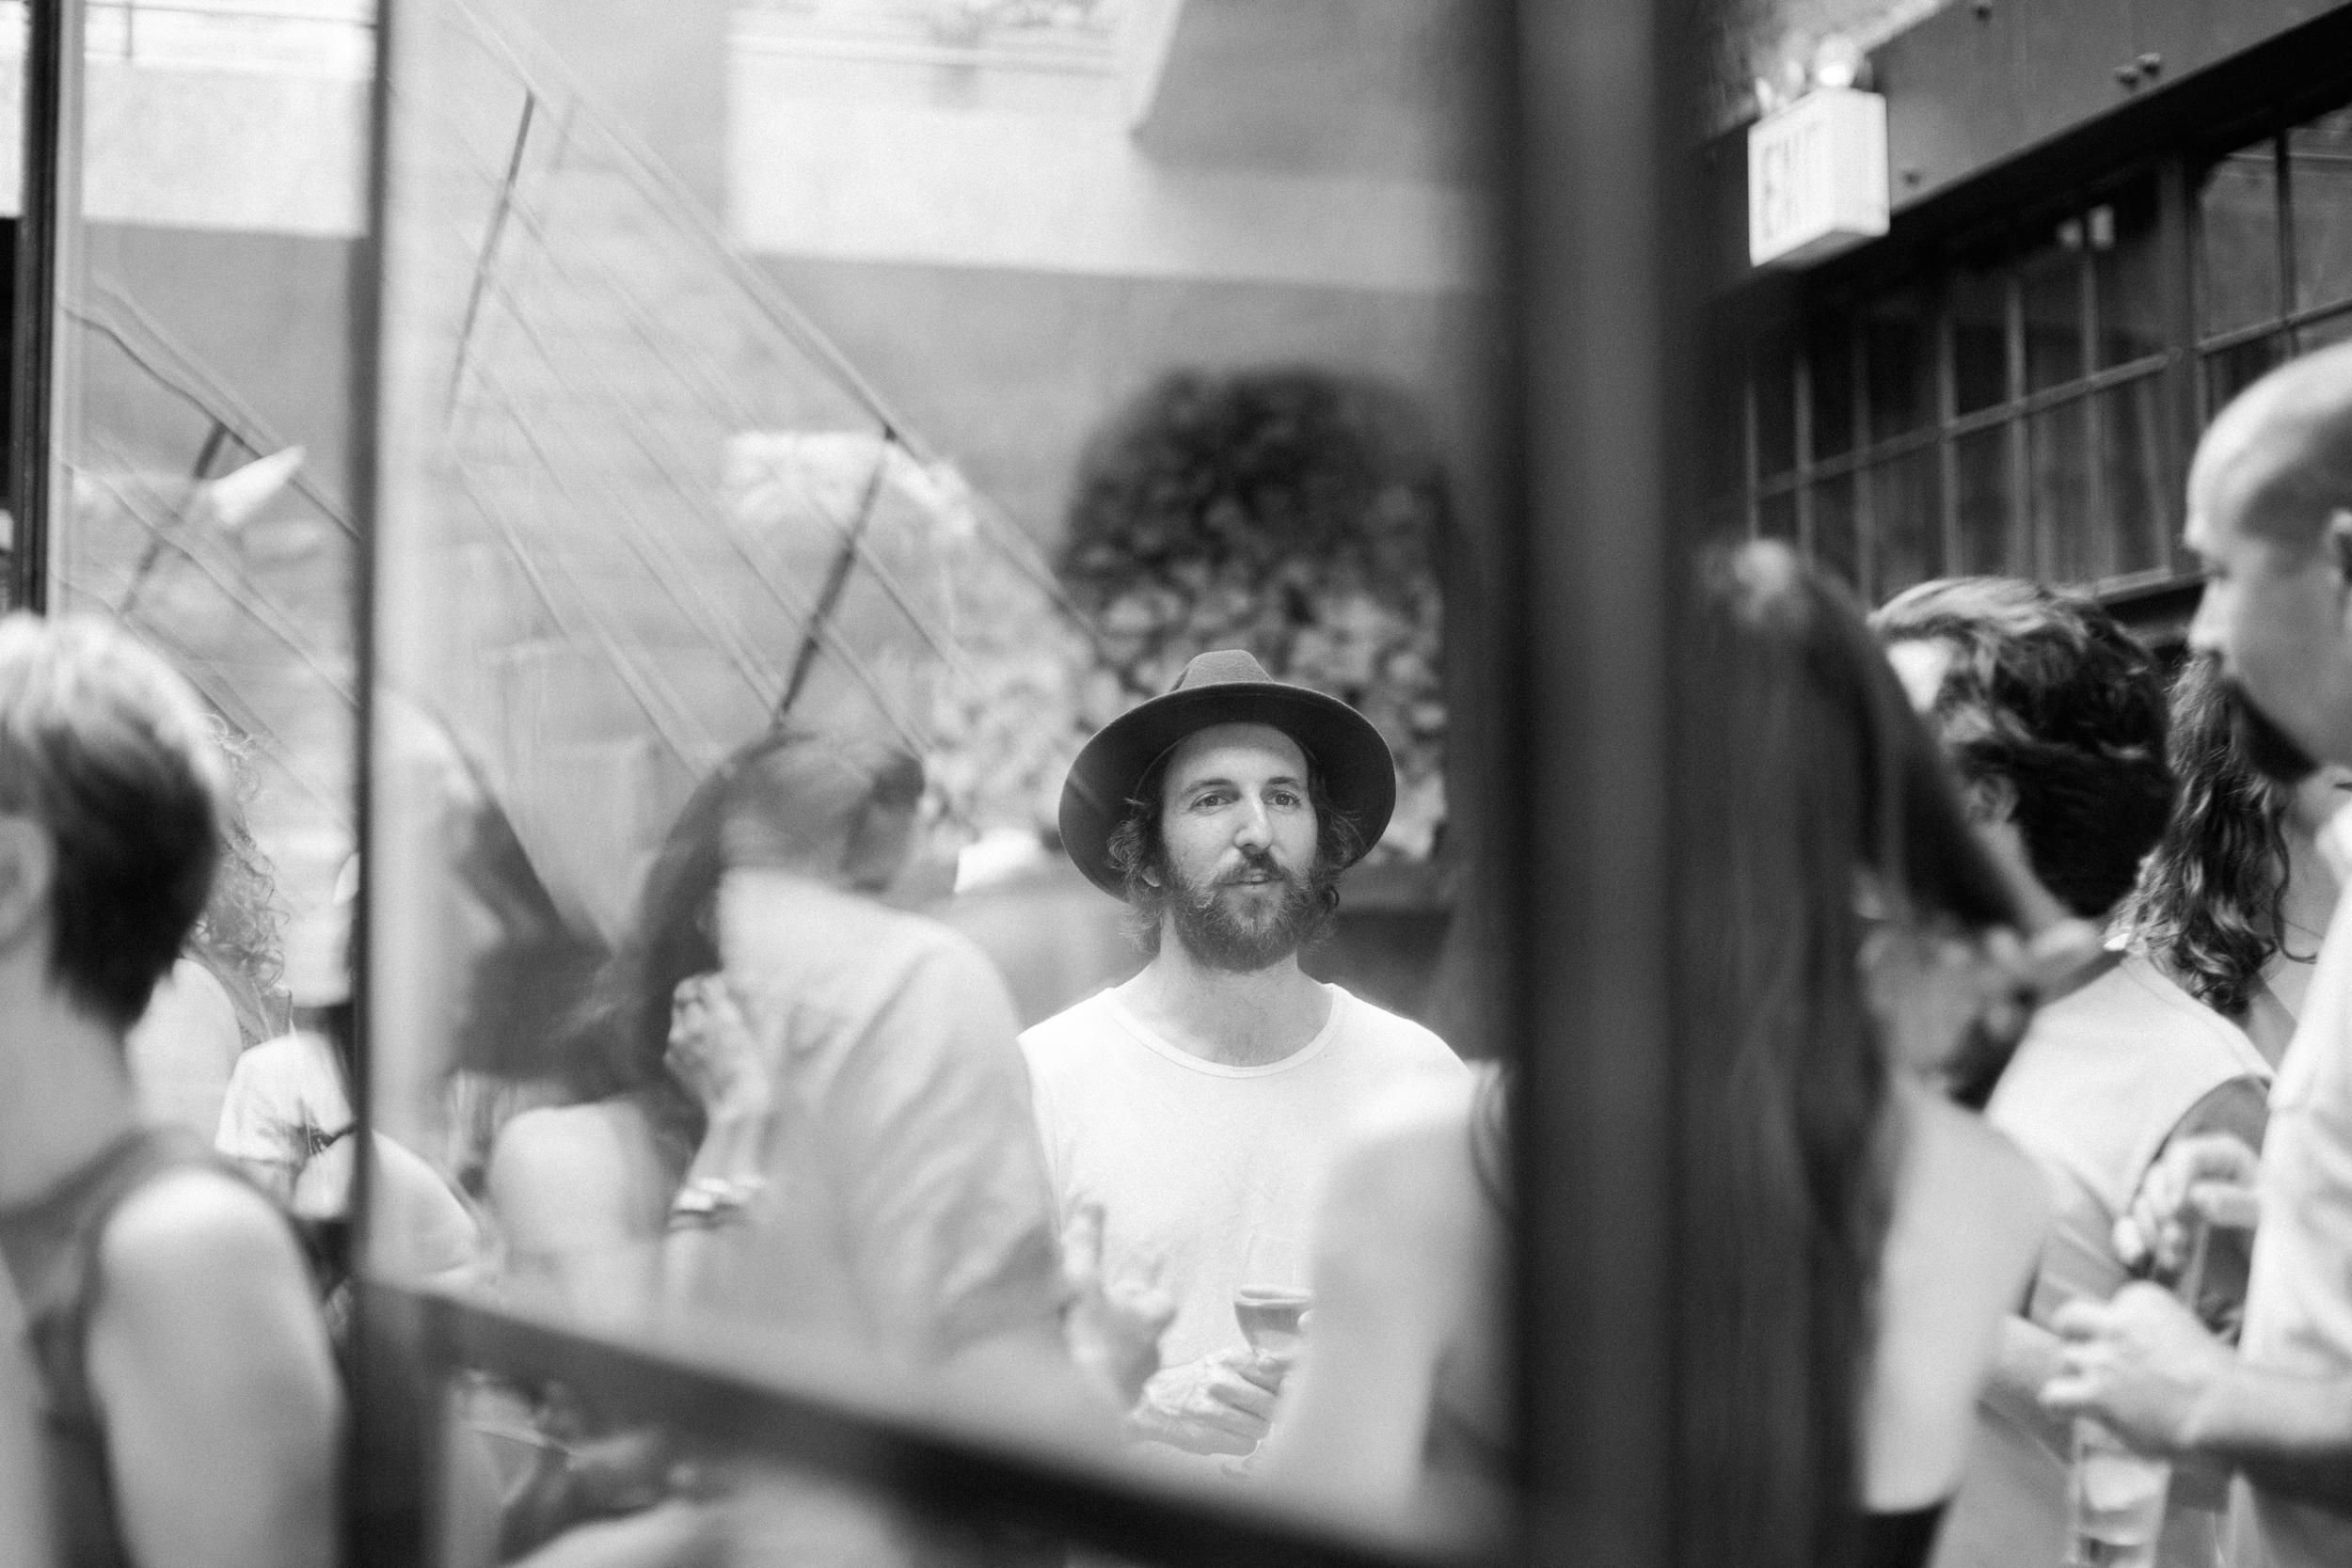 I spy Michael of Chellise Michael Photography!